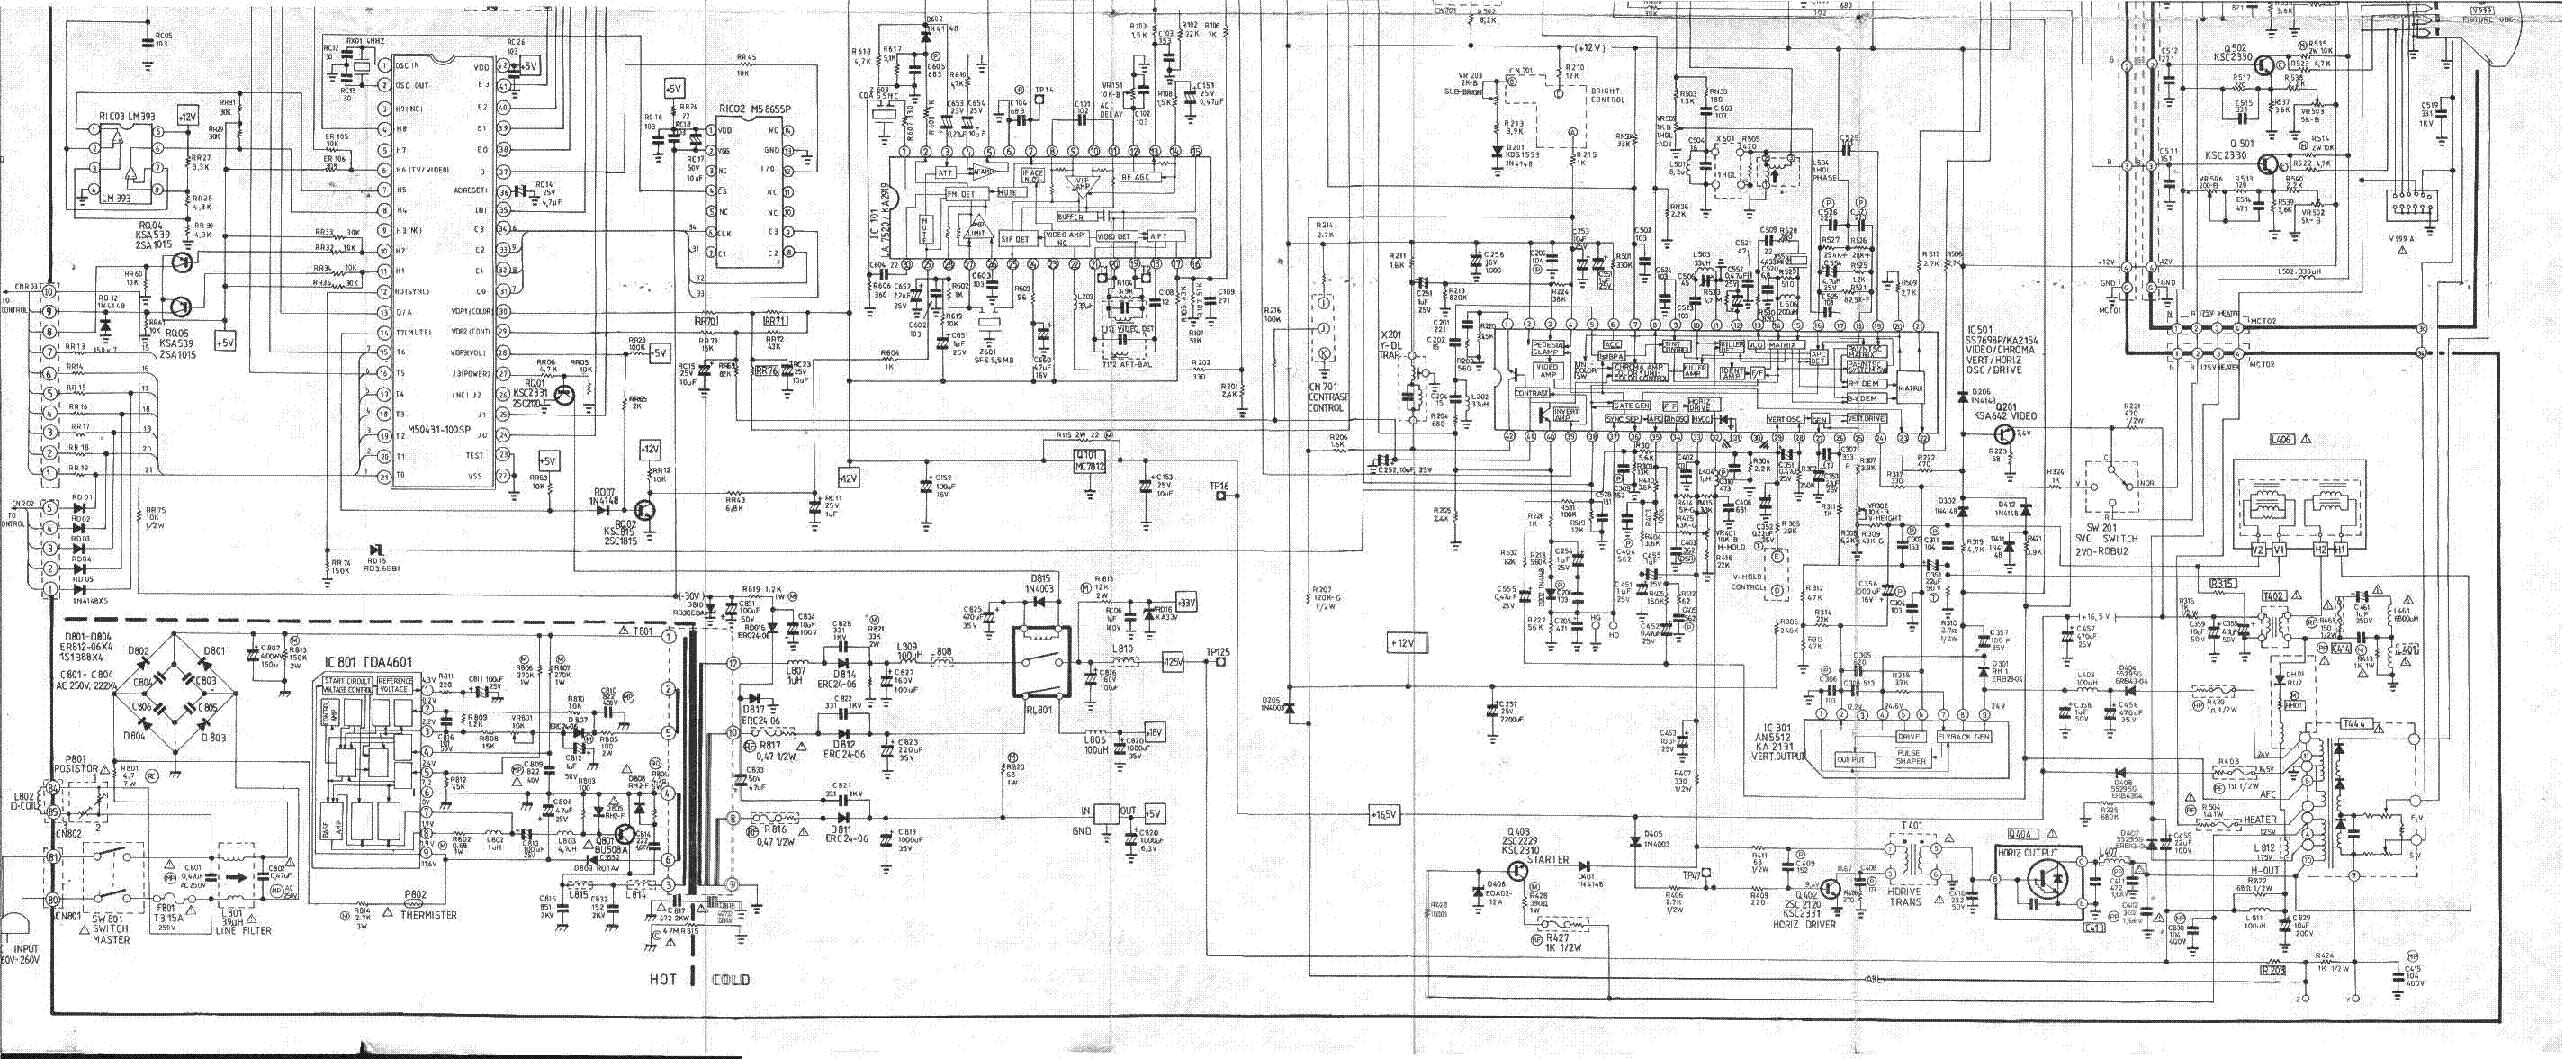 Samsung P54 Service Manual Download  Schematics  Eeprom